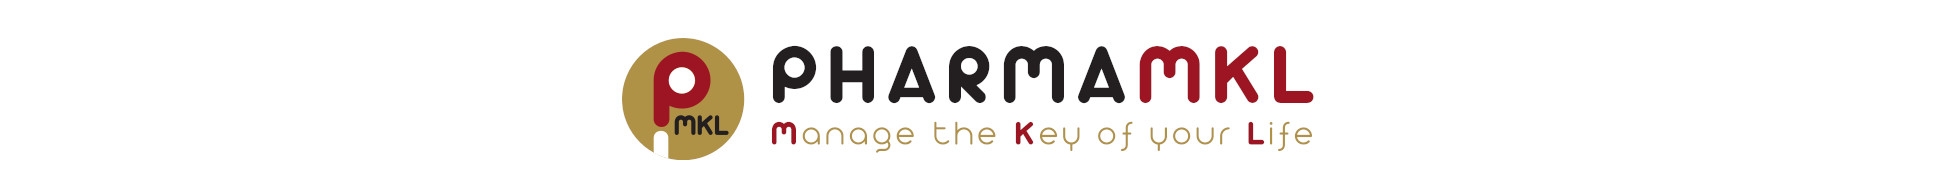 pharma mkl